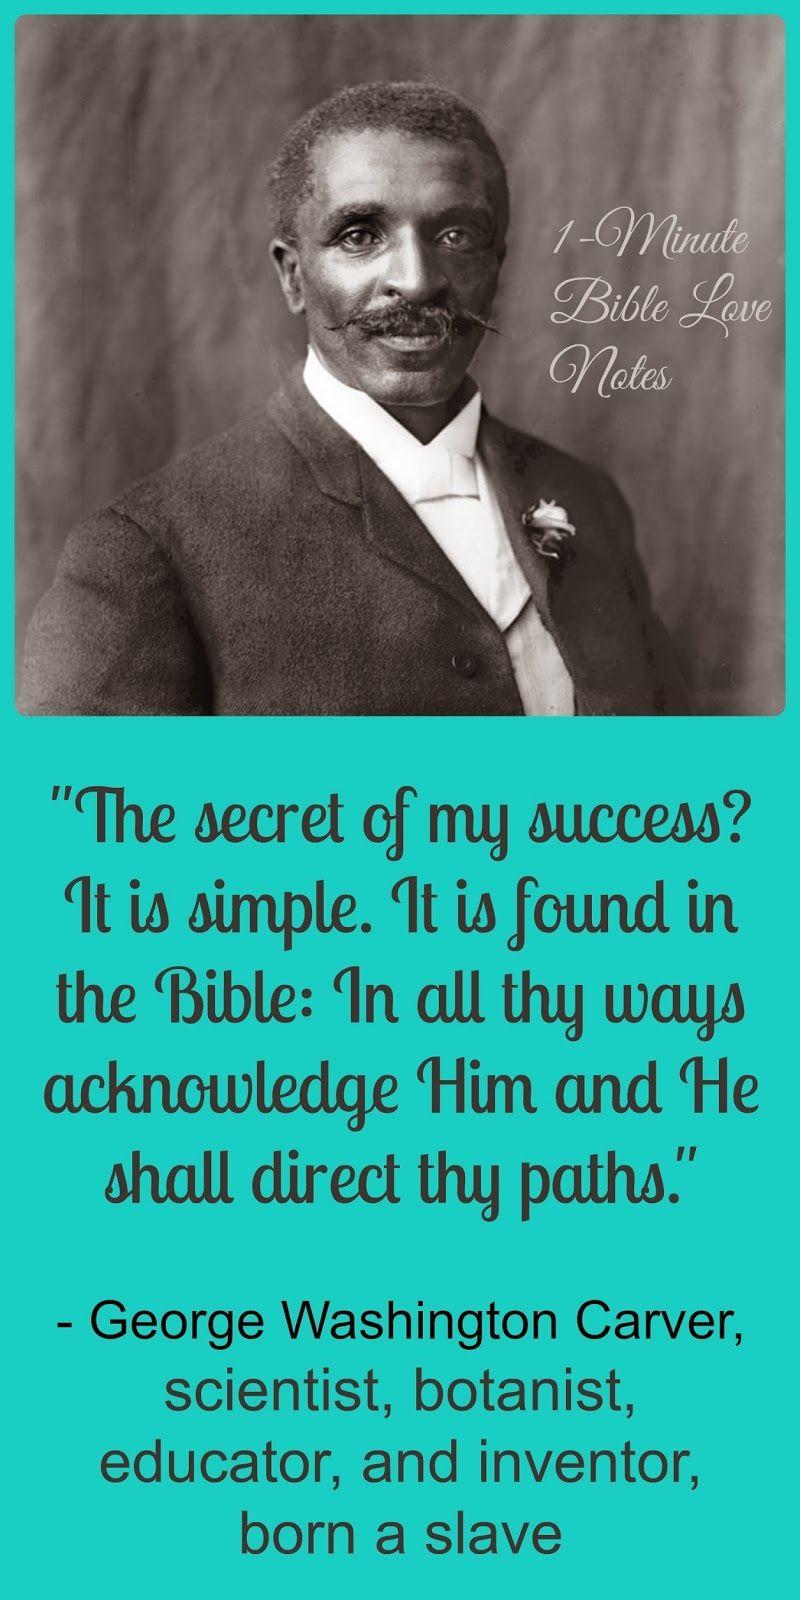 George Washington Carver - He Overcame Evil